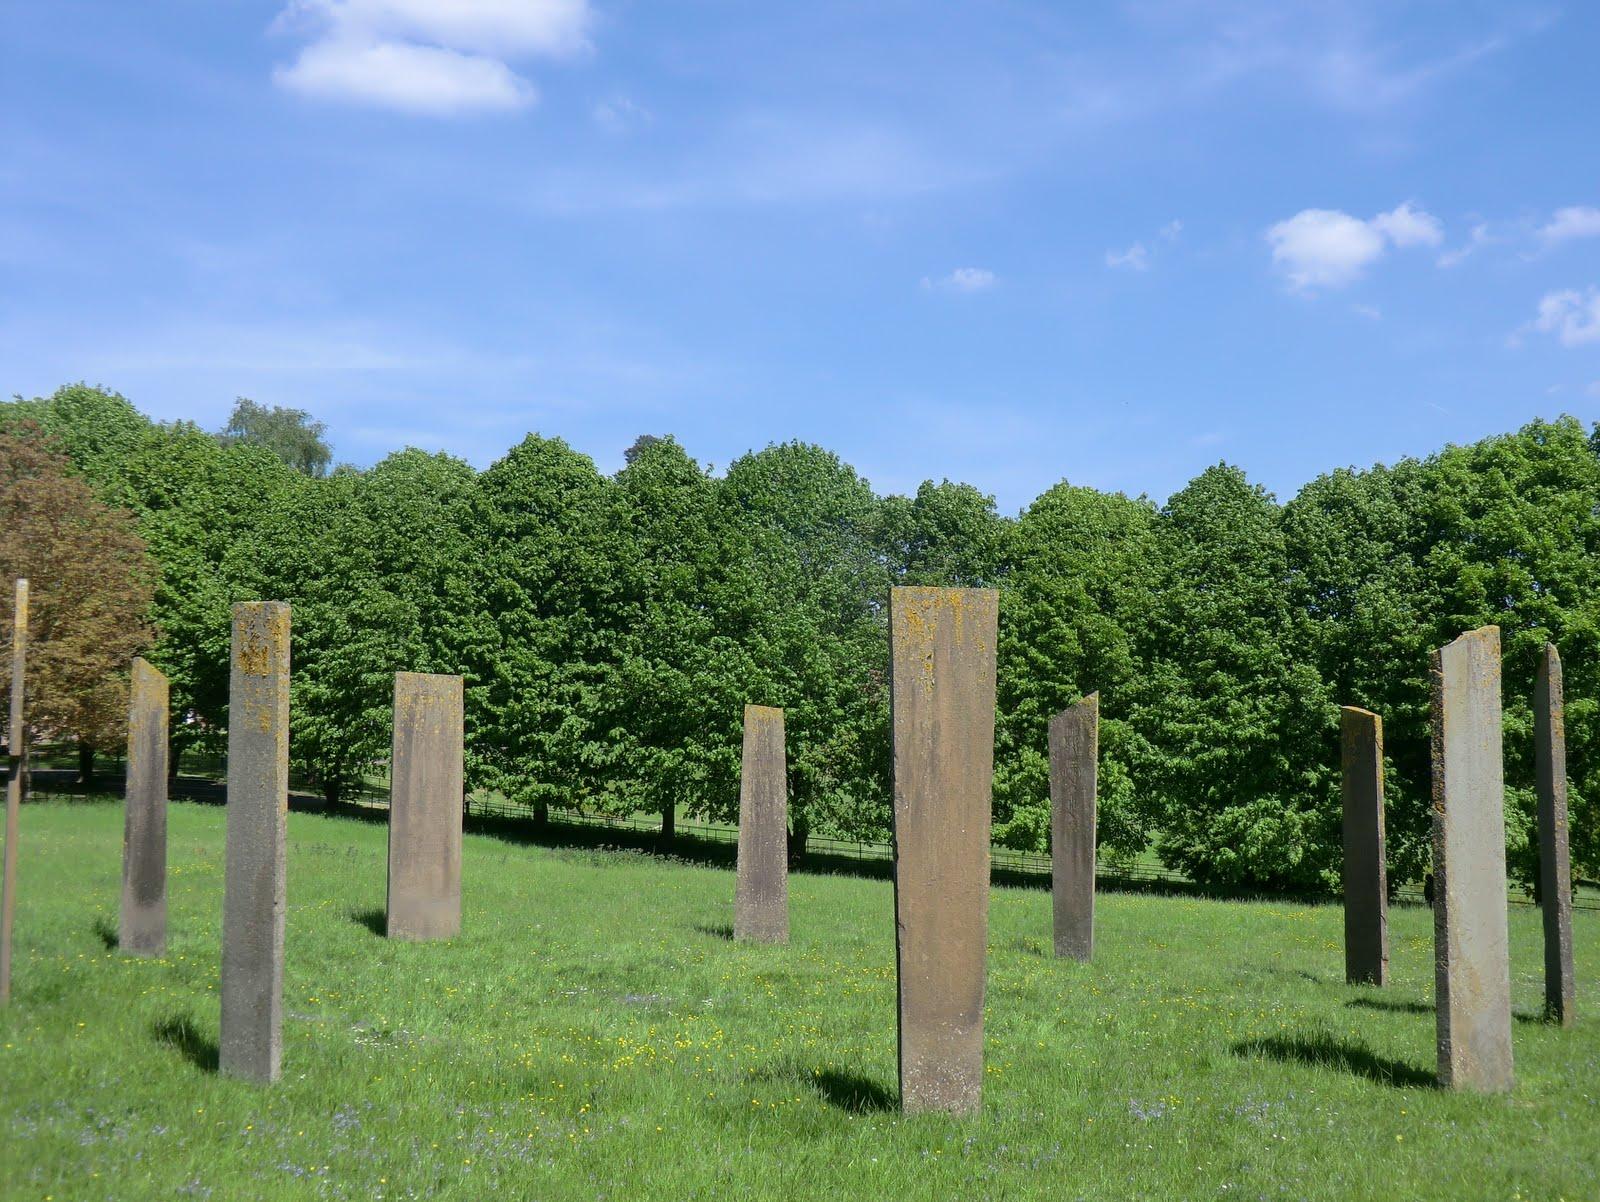 CIMG6801 Millennium Stones, Gatton Park